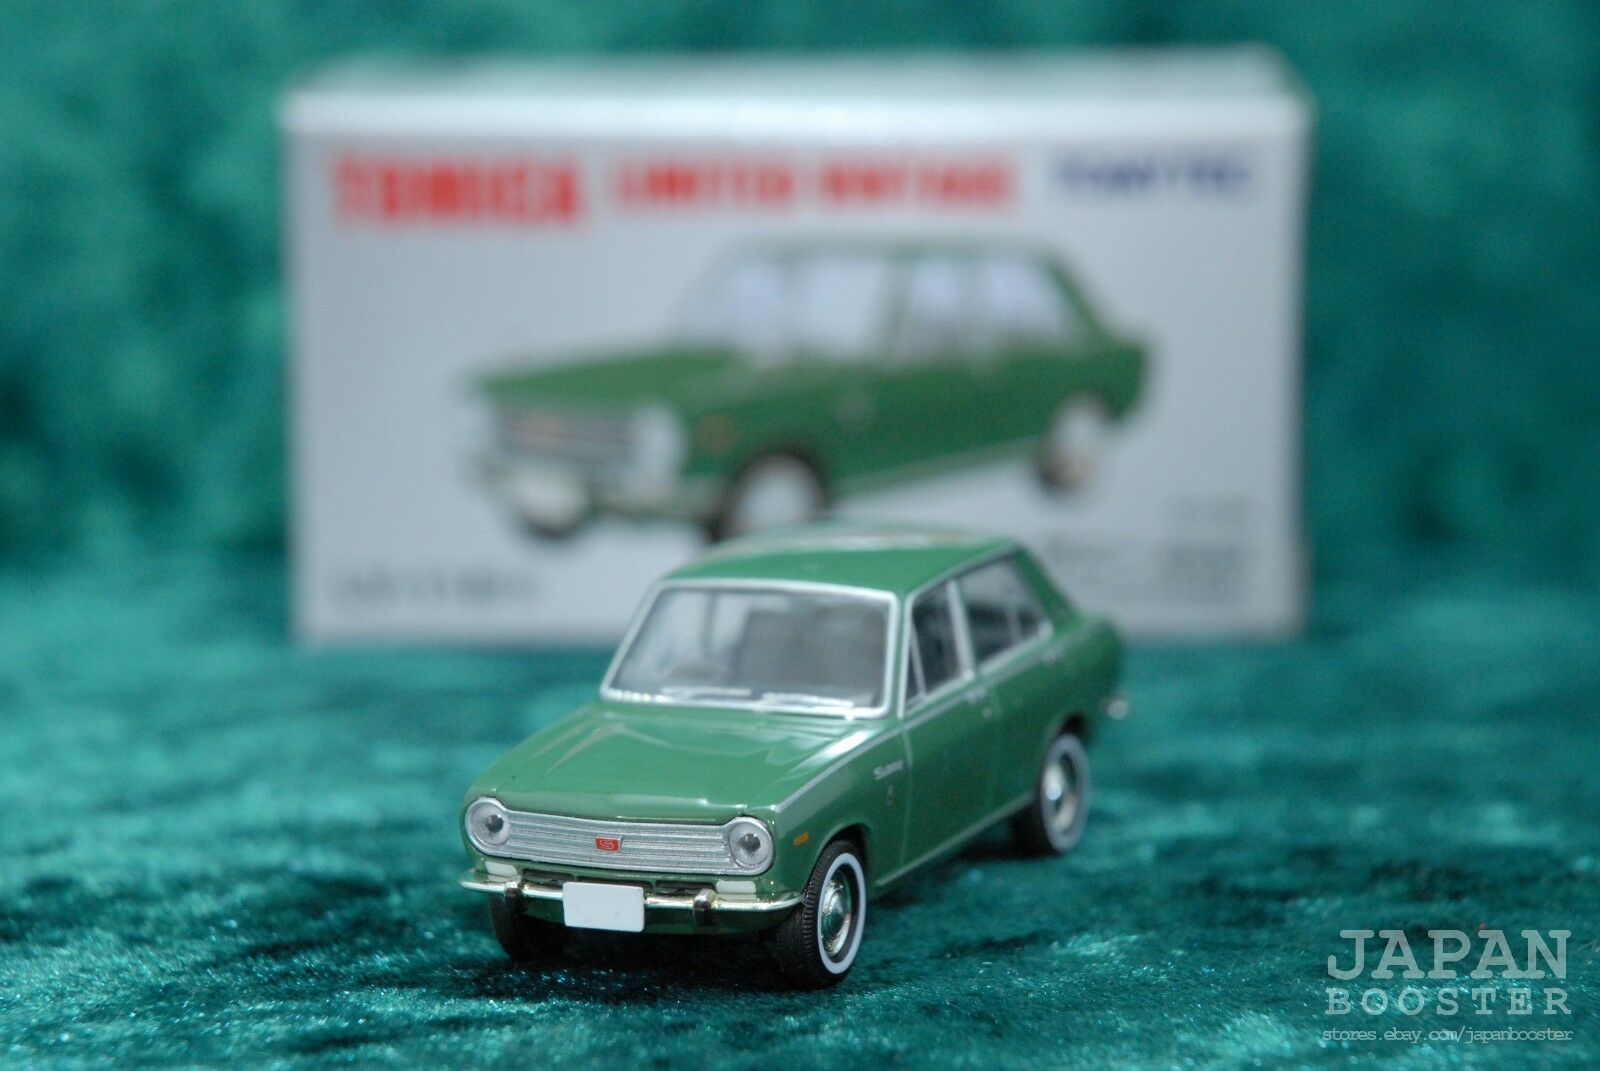 Tomica Limited Vintage 1 64 Lv 116 A Datsun Sunny 1000 Sports Dx Green For Sale Online Ebay